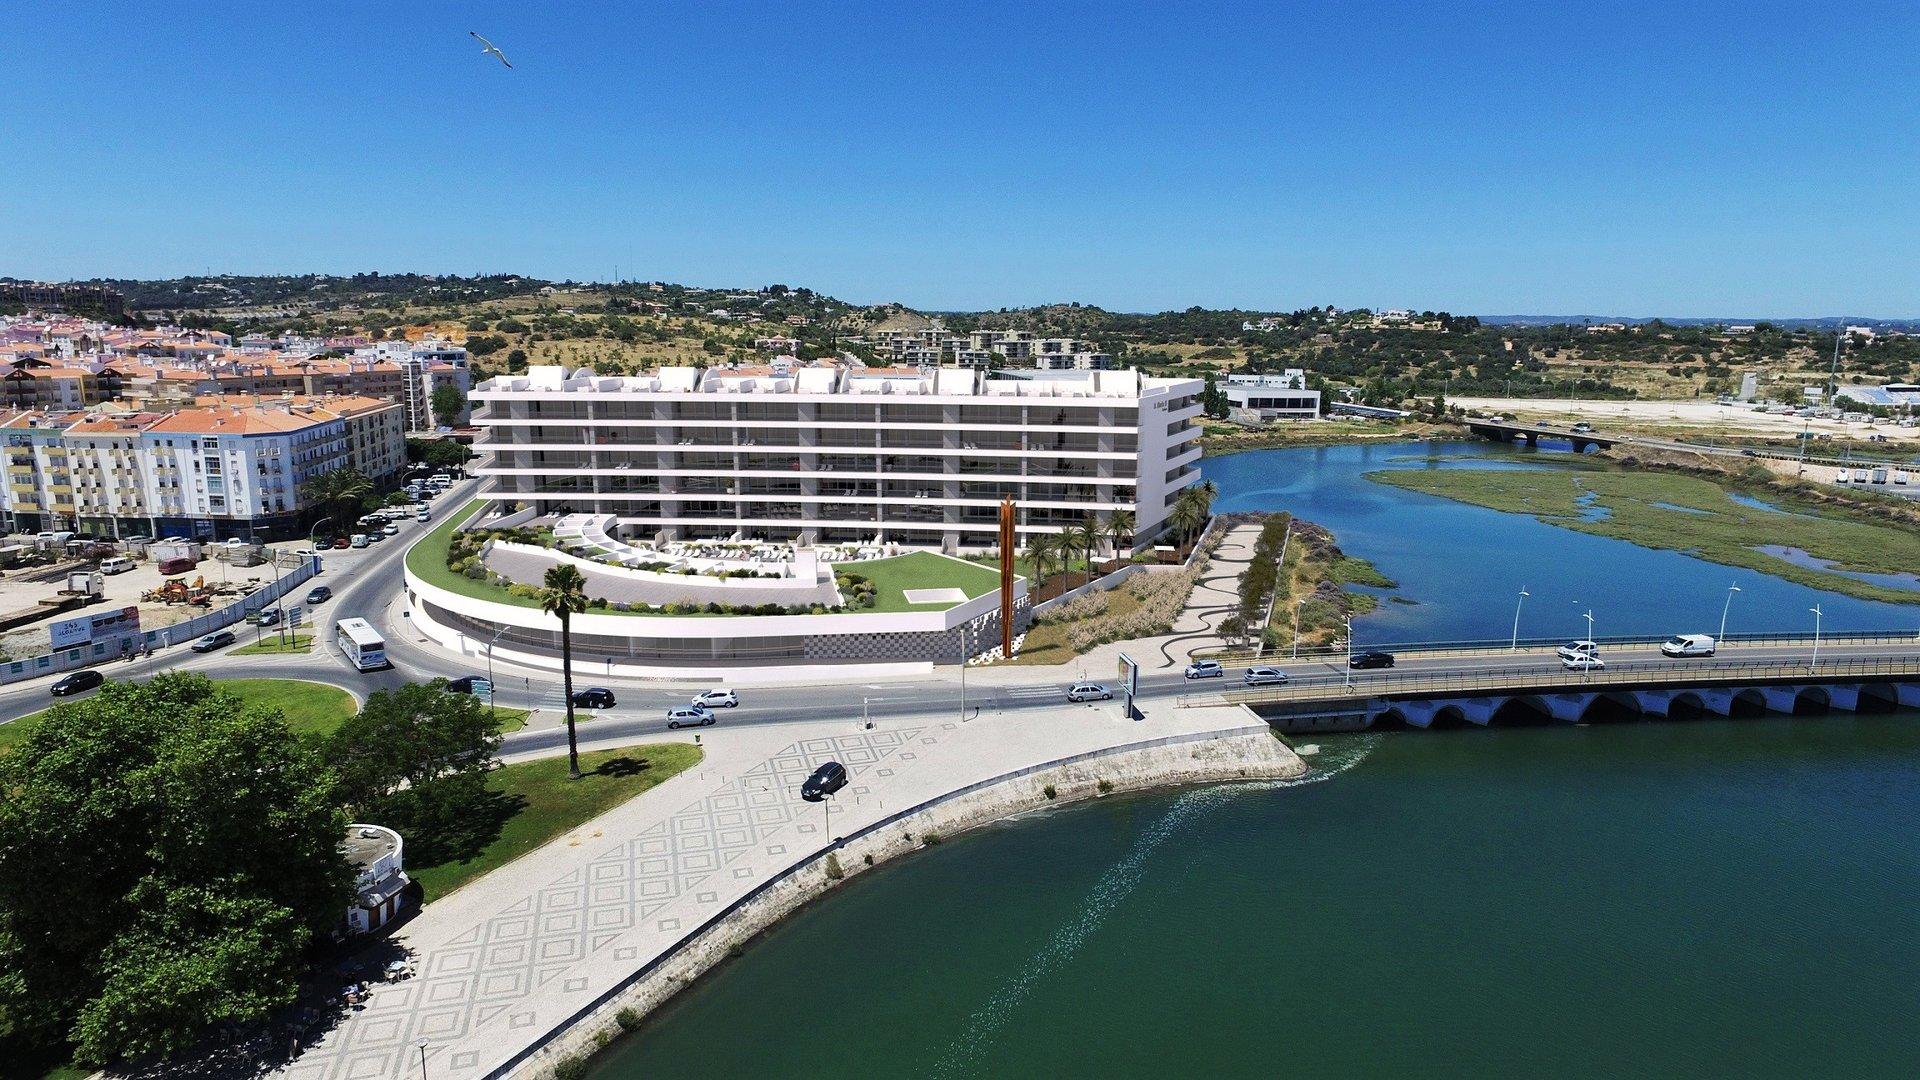 4 Bedroom Apartment Lagos, Western Algarve Ref: GV412C